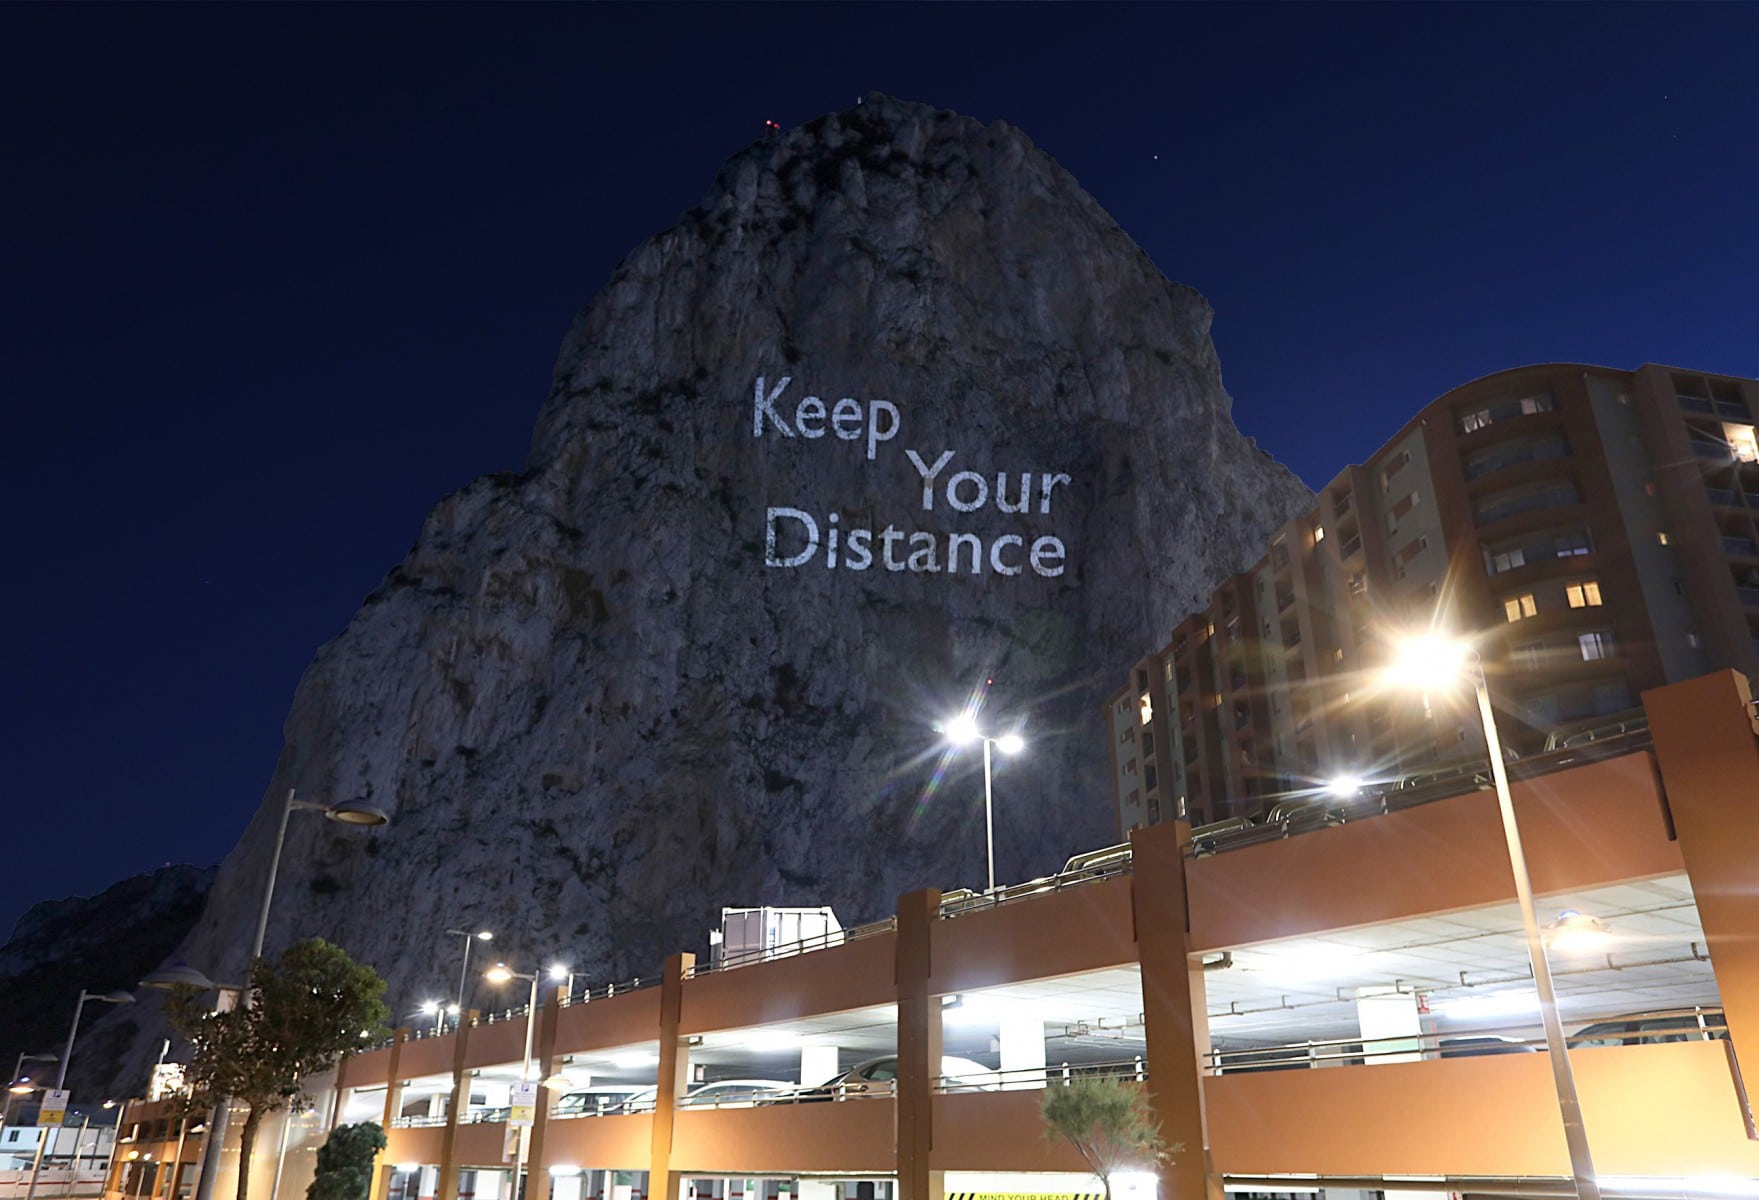 keep-your-distance_49850442083_o